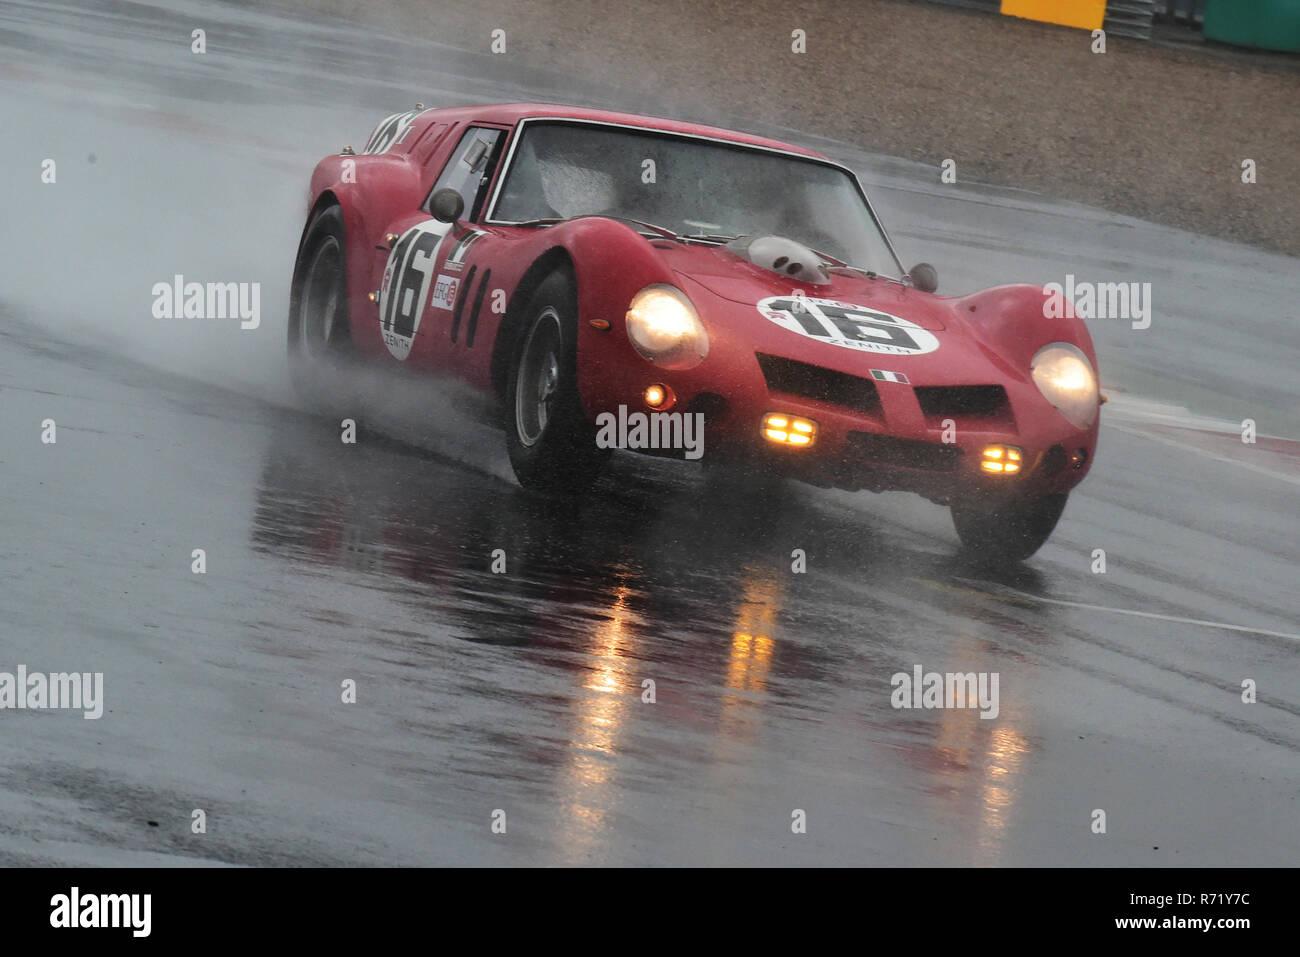 Lukas Halusa, Niklas Halusa, Ferrari 250GT, Ferrari Breadvan, RAC Tourist Trophy, historic cars, pre-63 GT, Silverstone Classic 2015, Chris McEvoy, cj - Stock Image